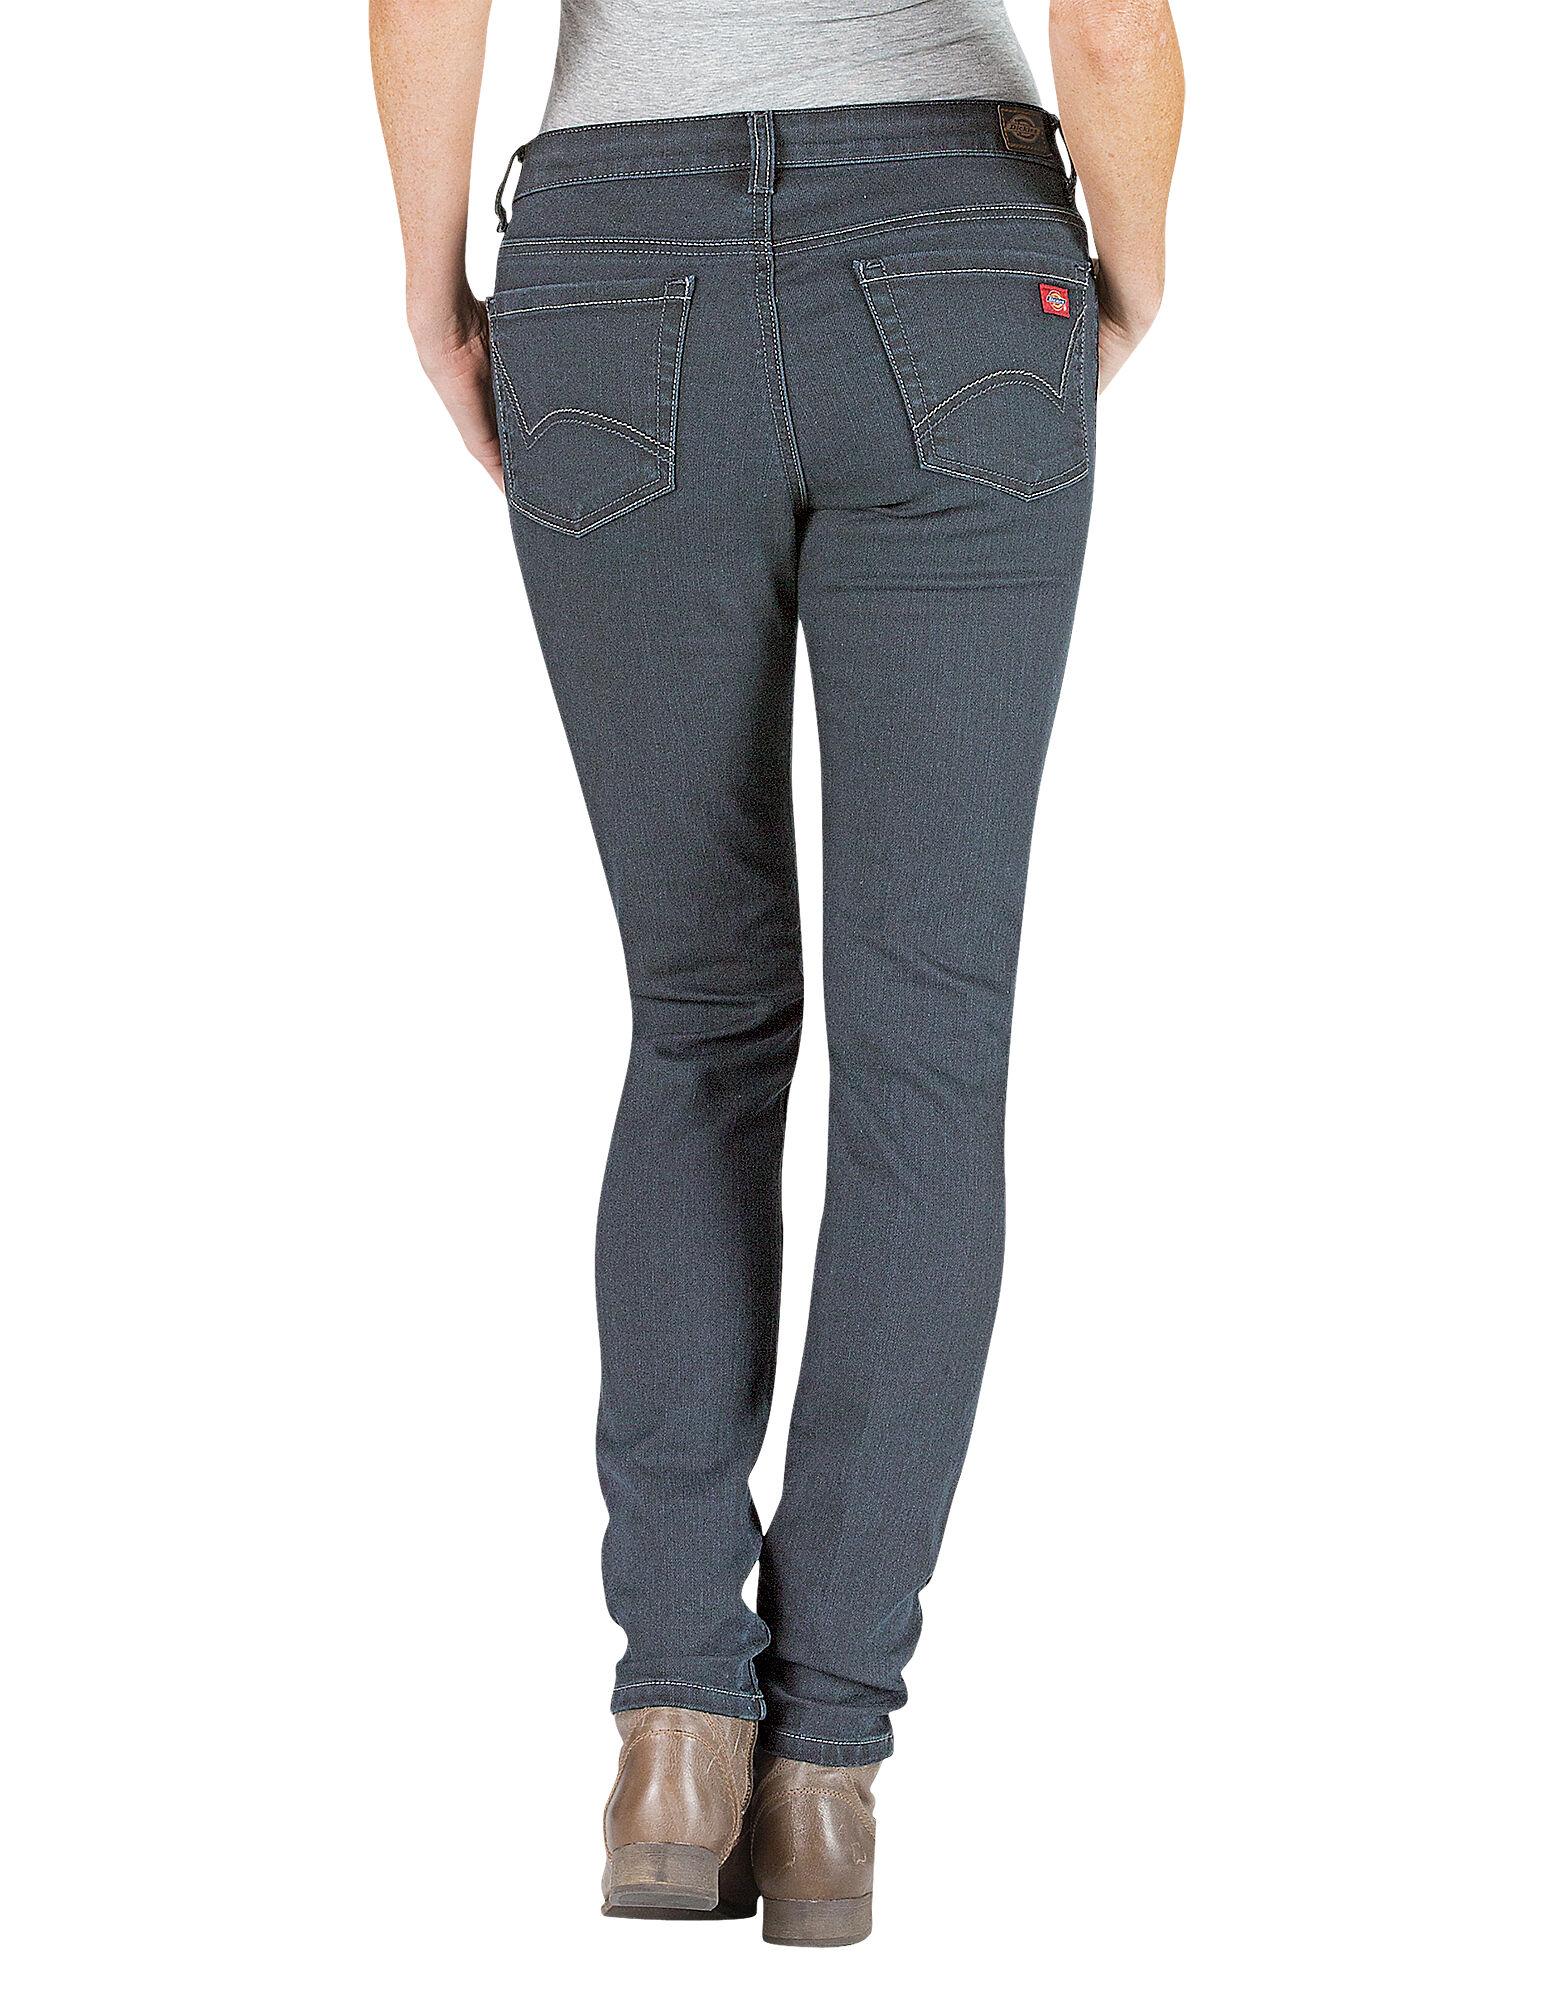 Women&39s Slim Fit Skinny Leg Denim Jean   Womens Jeans   Dickies